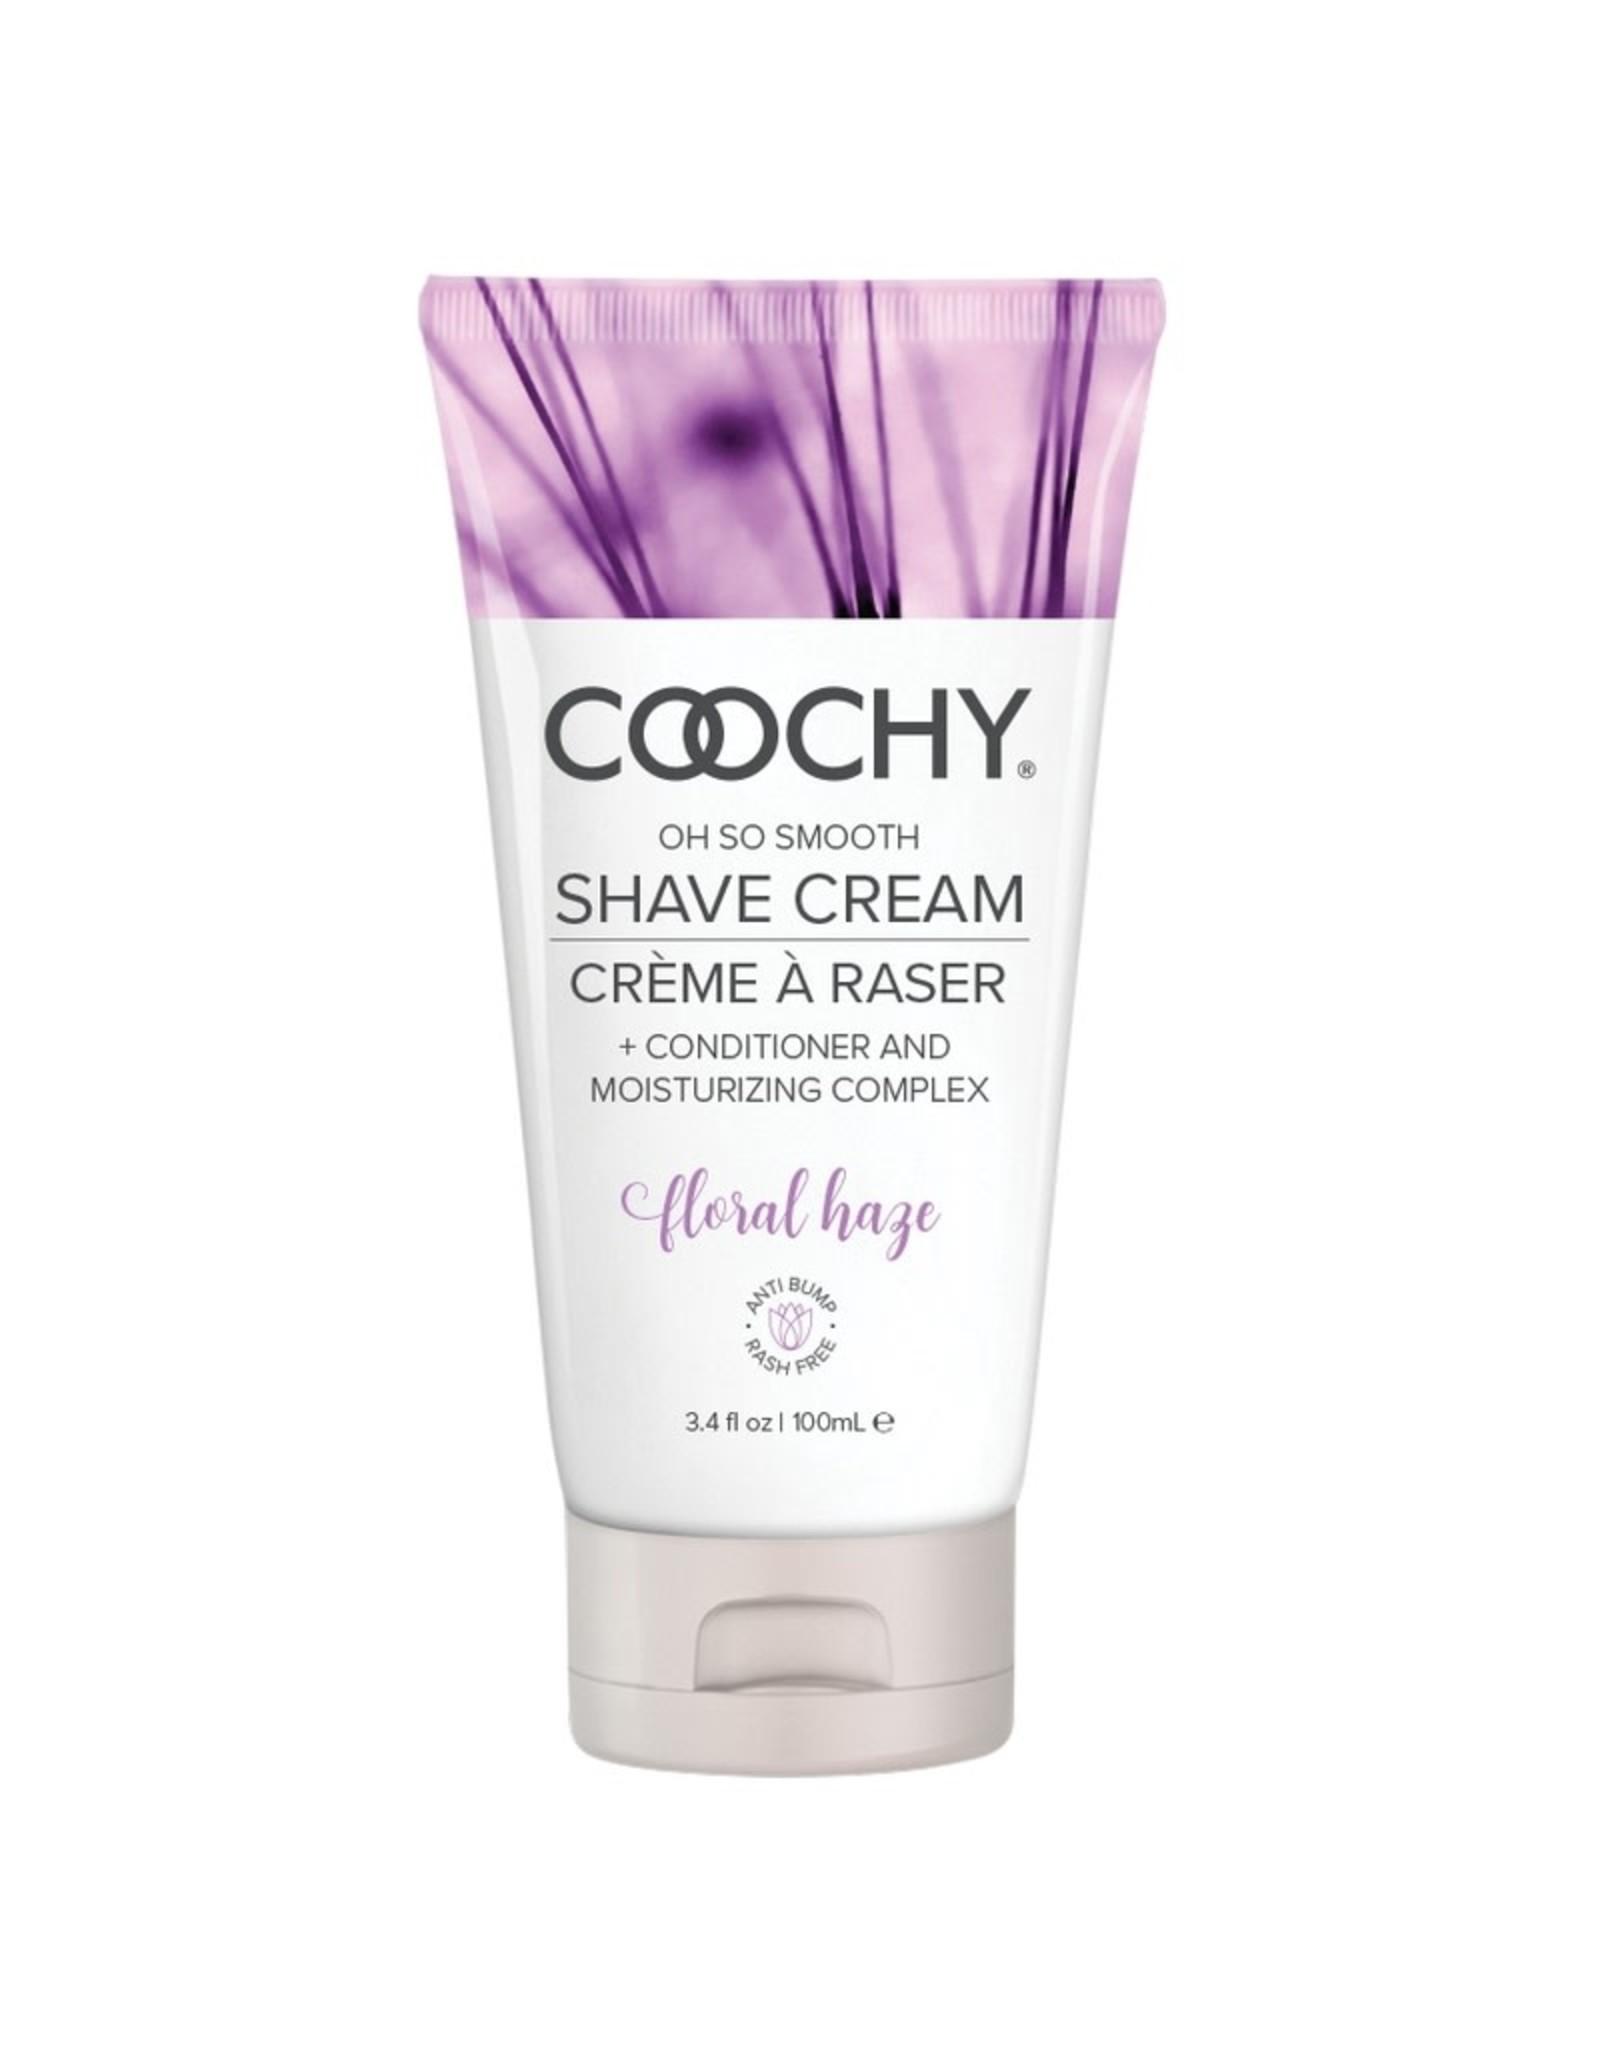 Classic Brands Coochy - Floral Haze - 3.4 oz